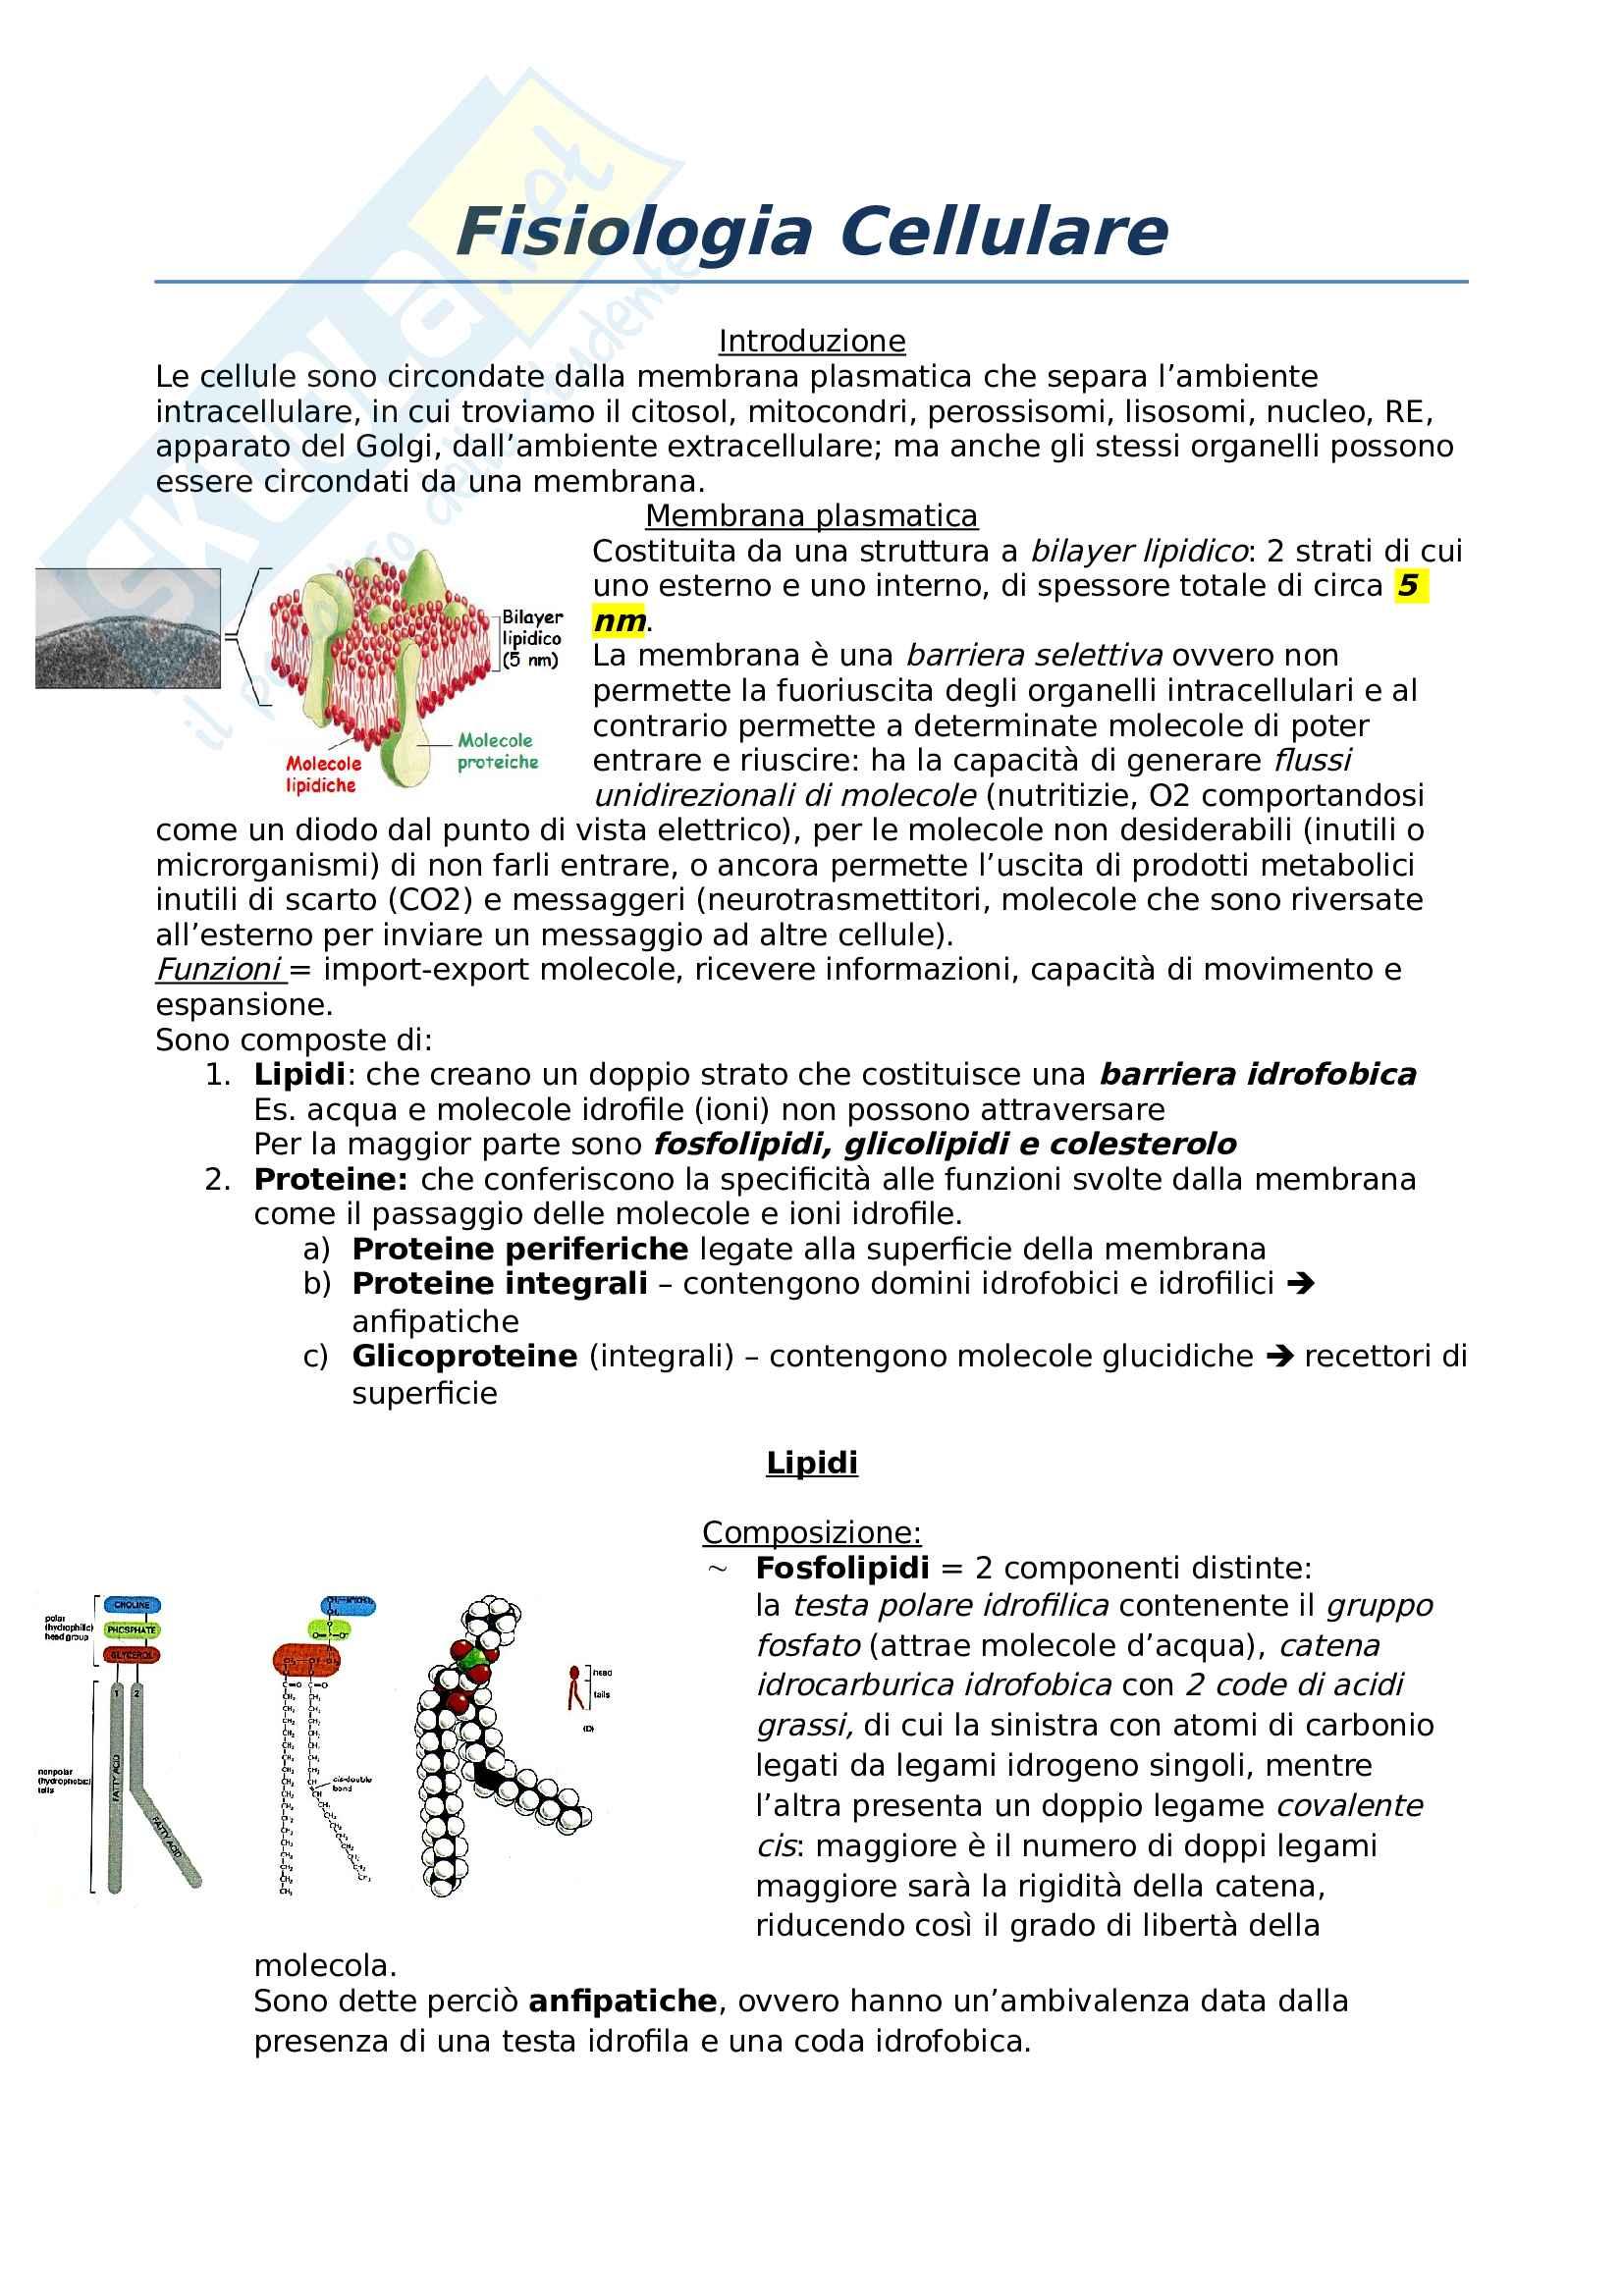 Fisiologia cellulare